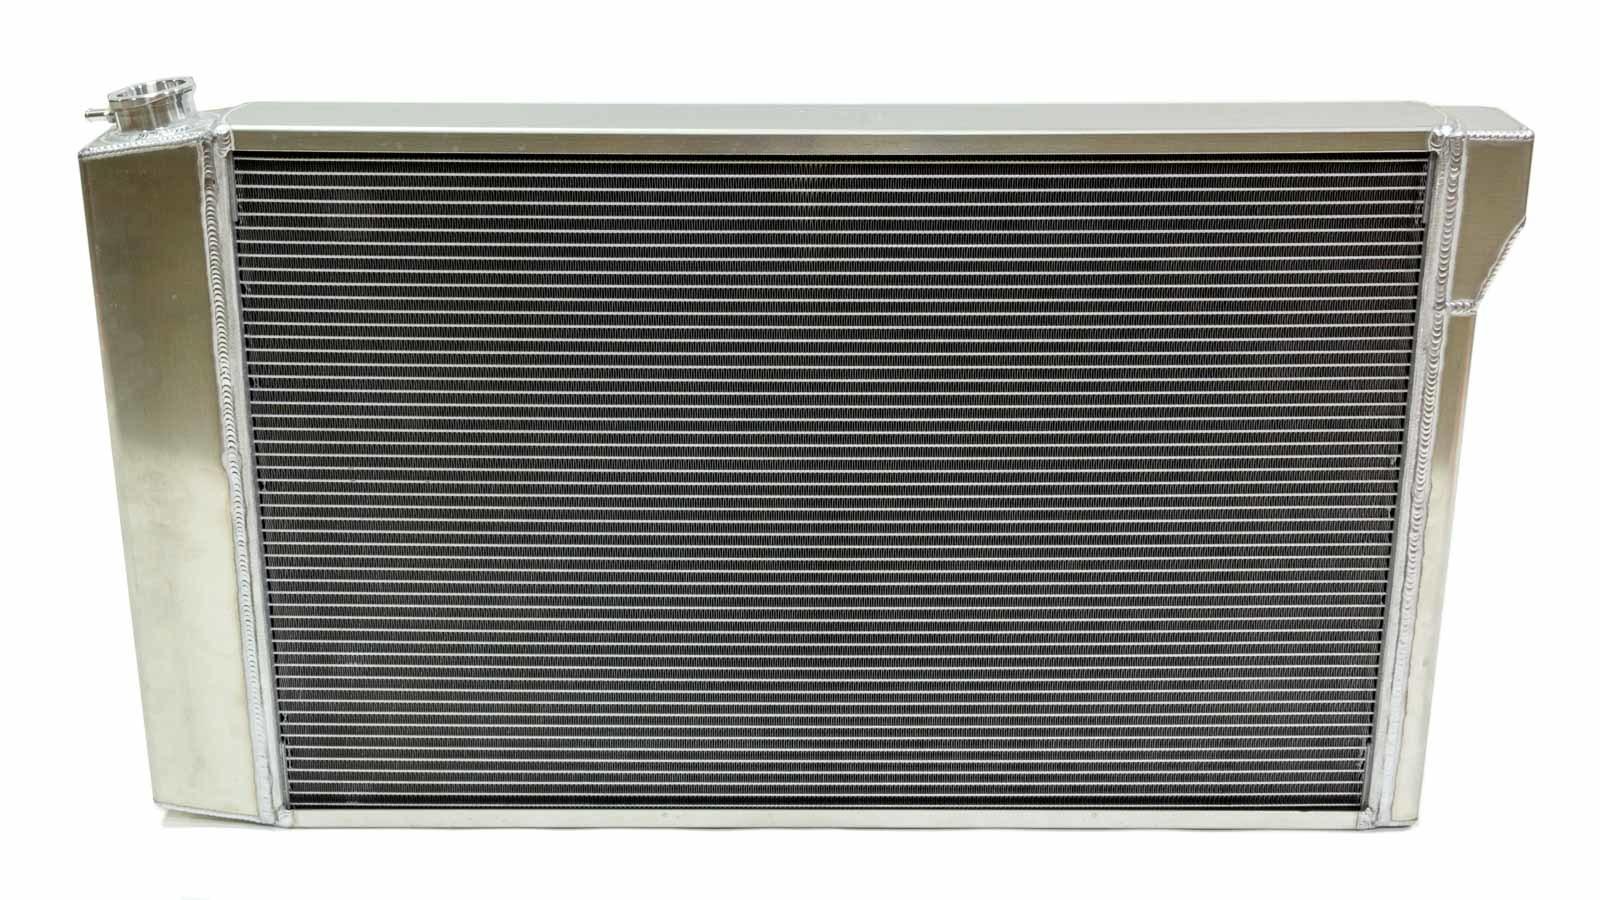 Radiator Chevelle 68-72 LS1